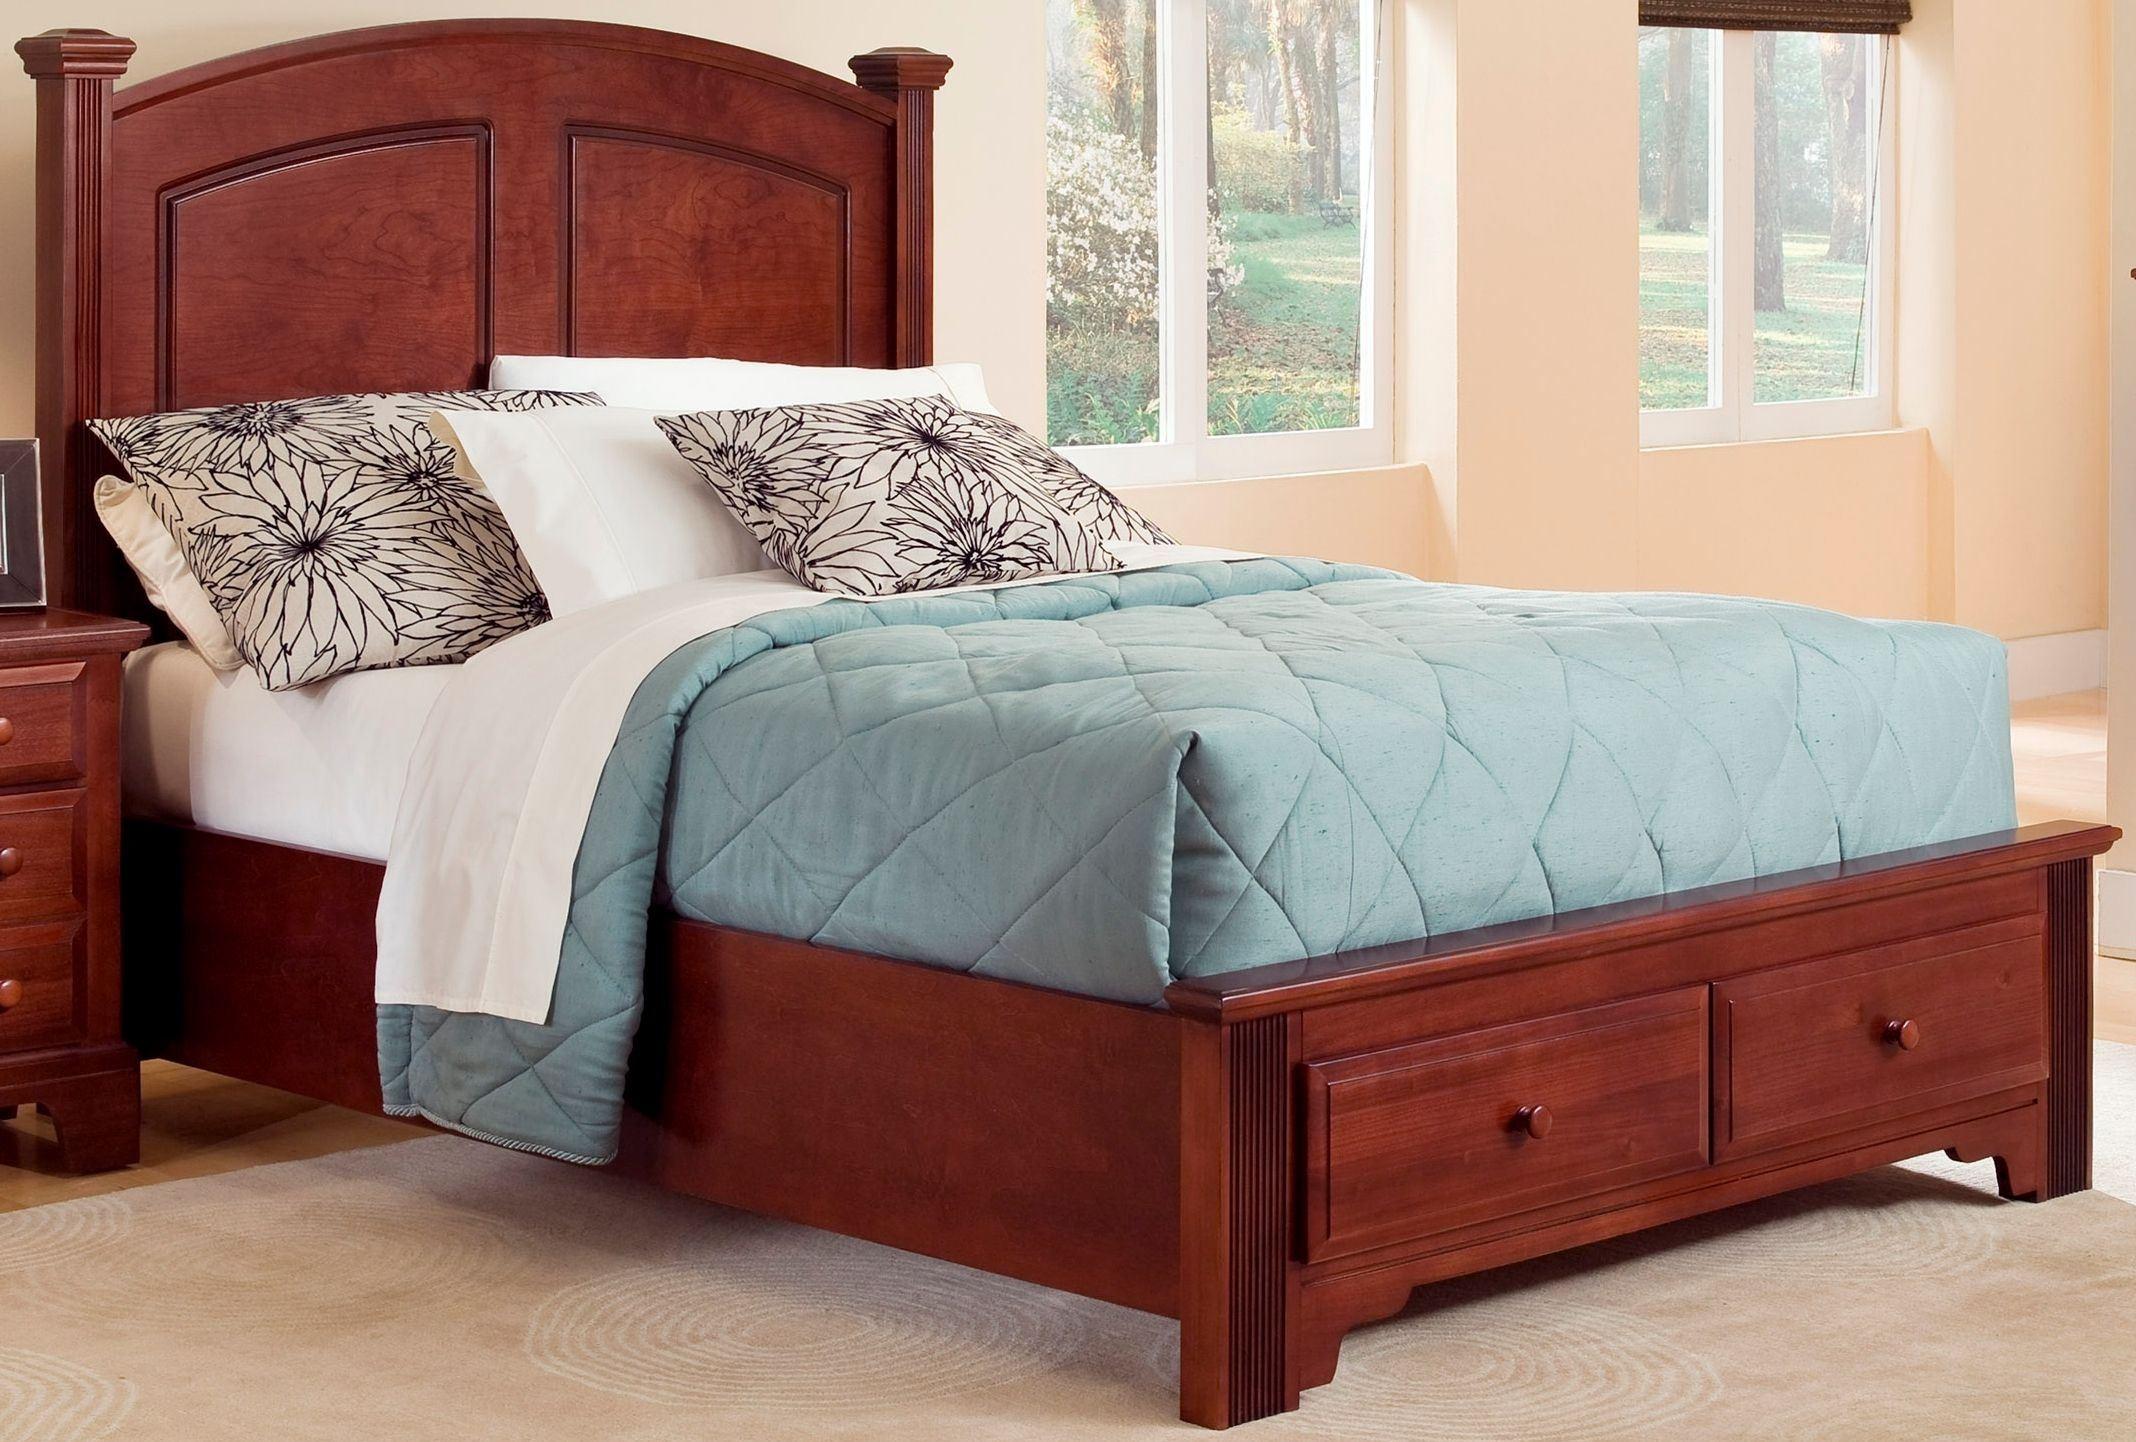 Hamilton Franklin Cherry Youth Panel Storage Bedroom Set BB5 338 033B 302 33